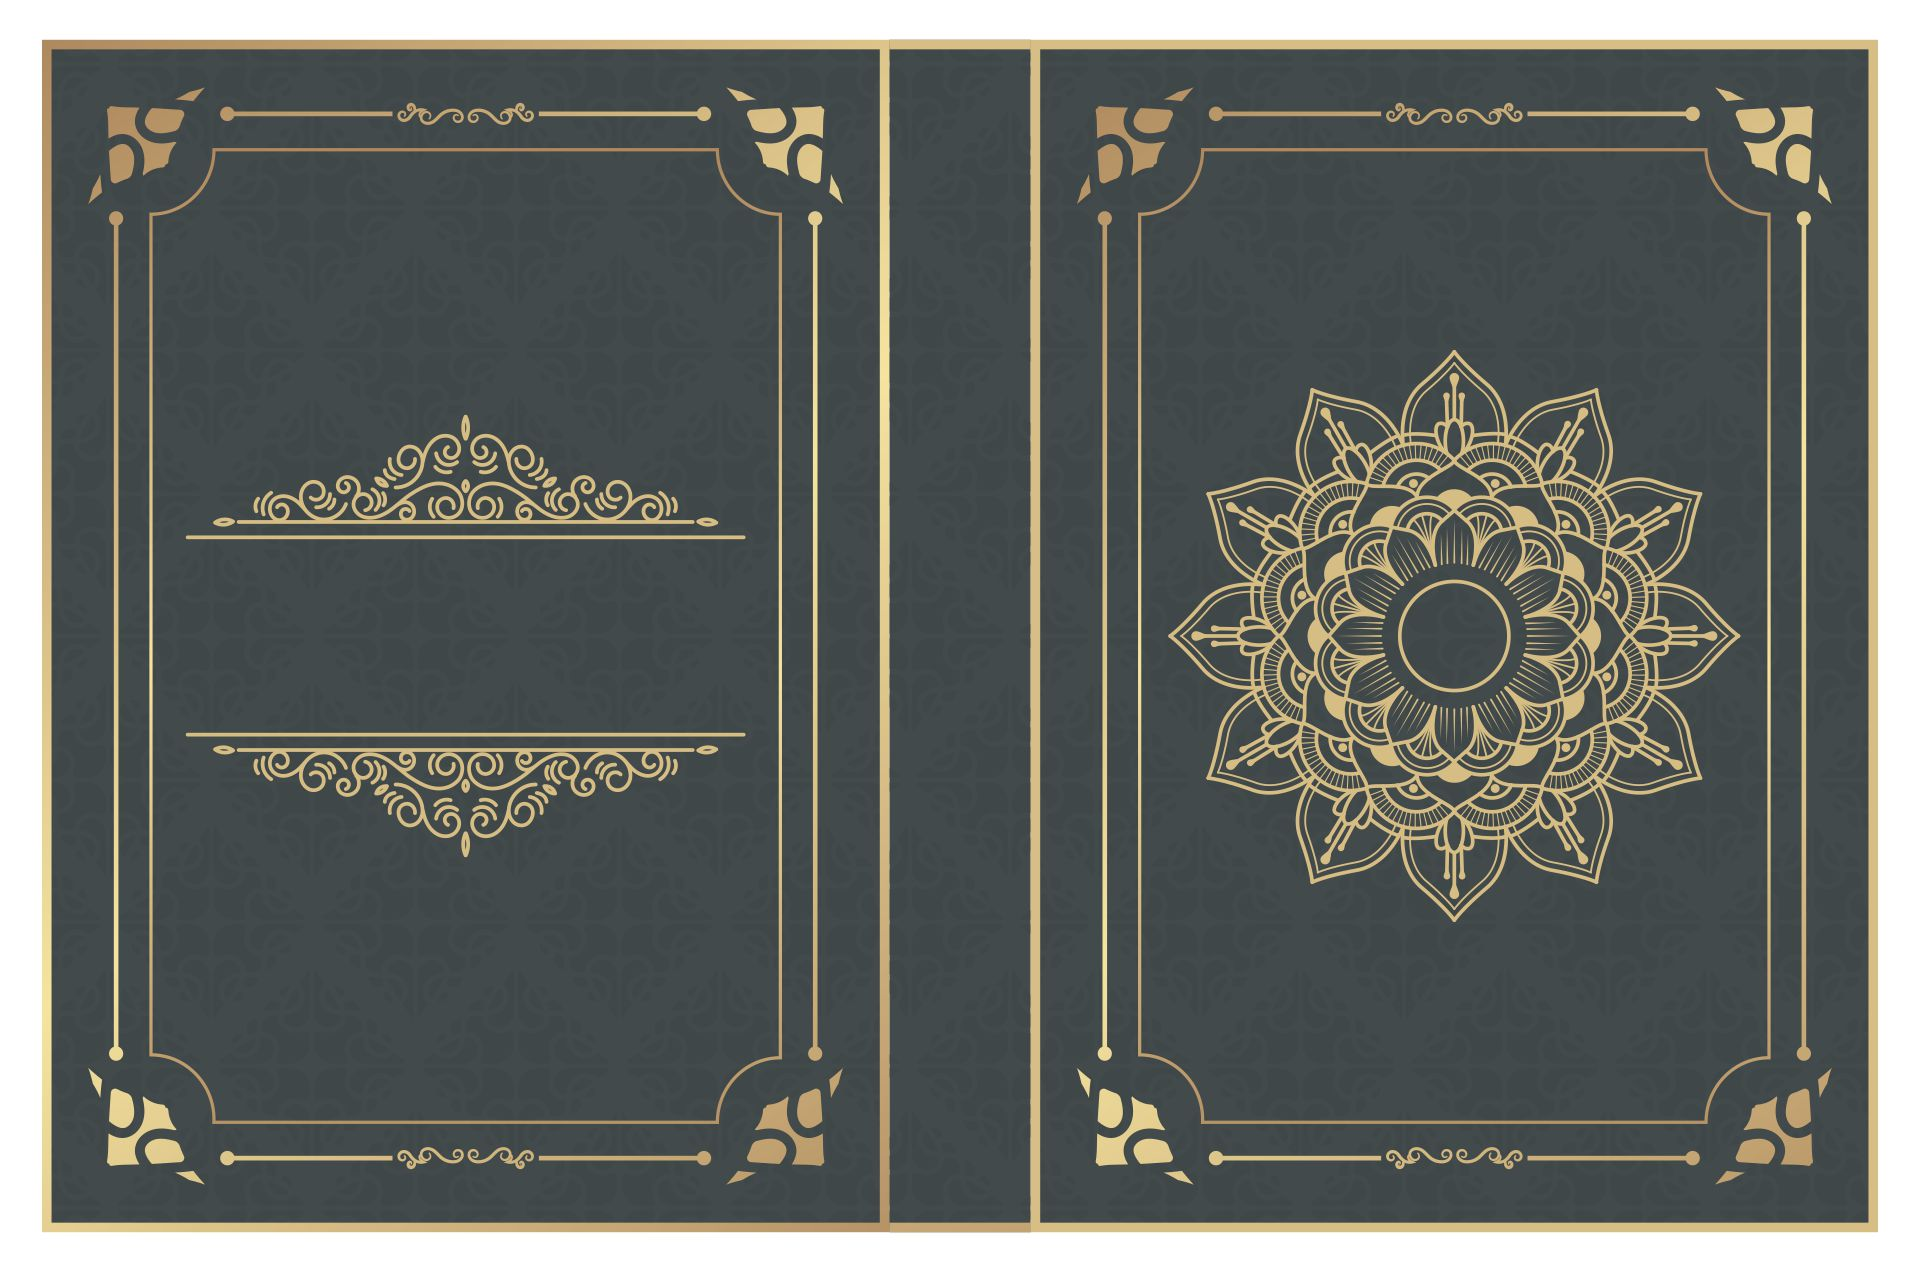 Miniature Book Covers To Print